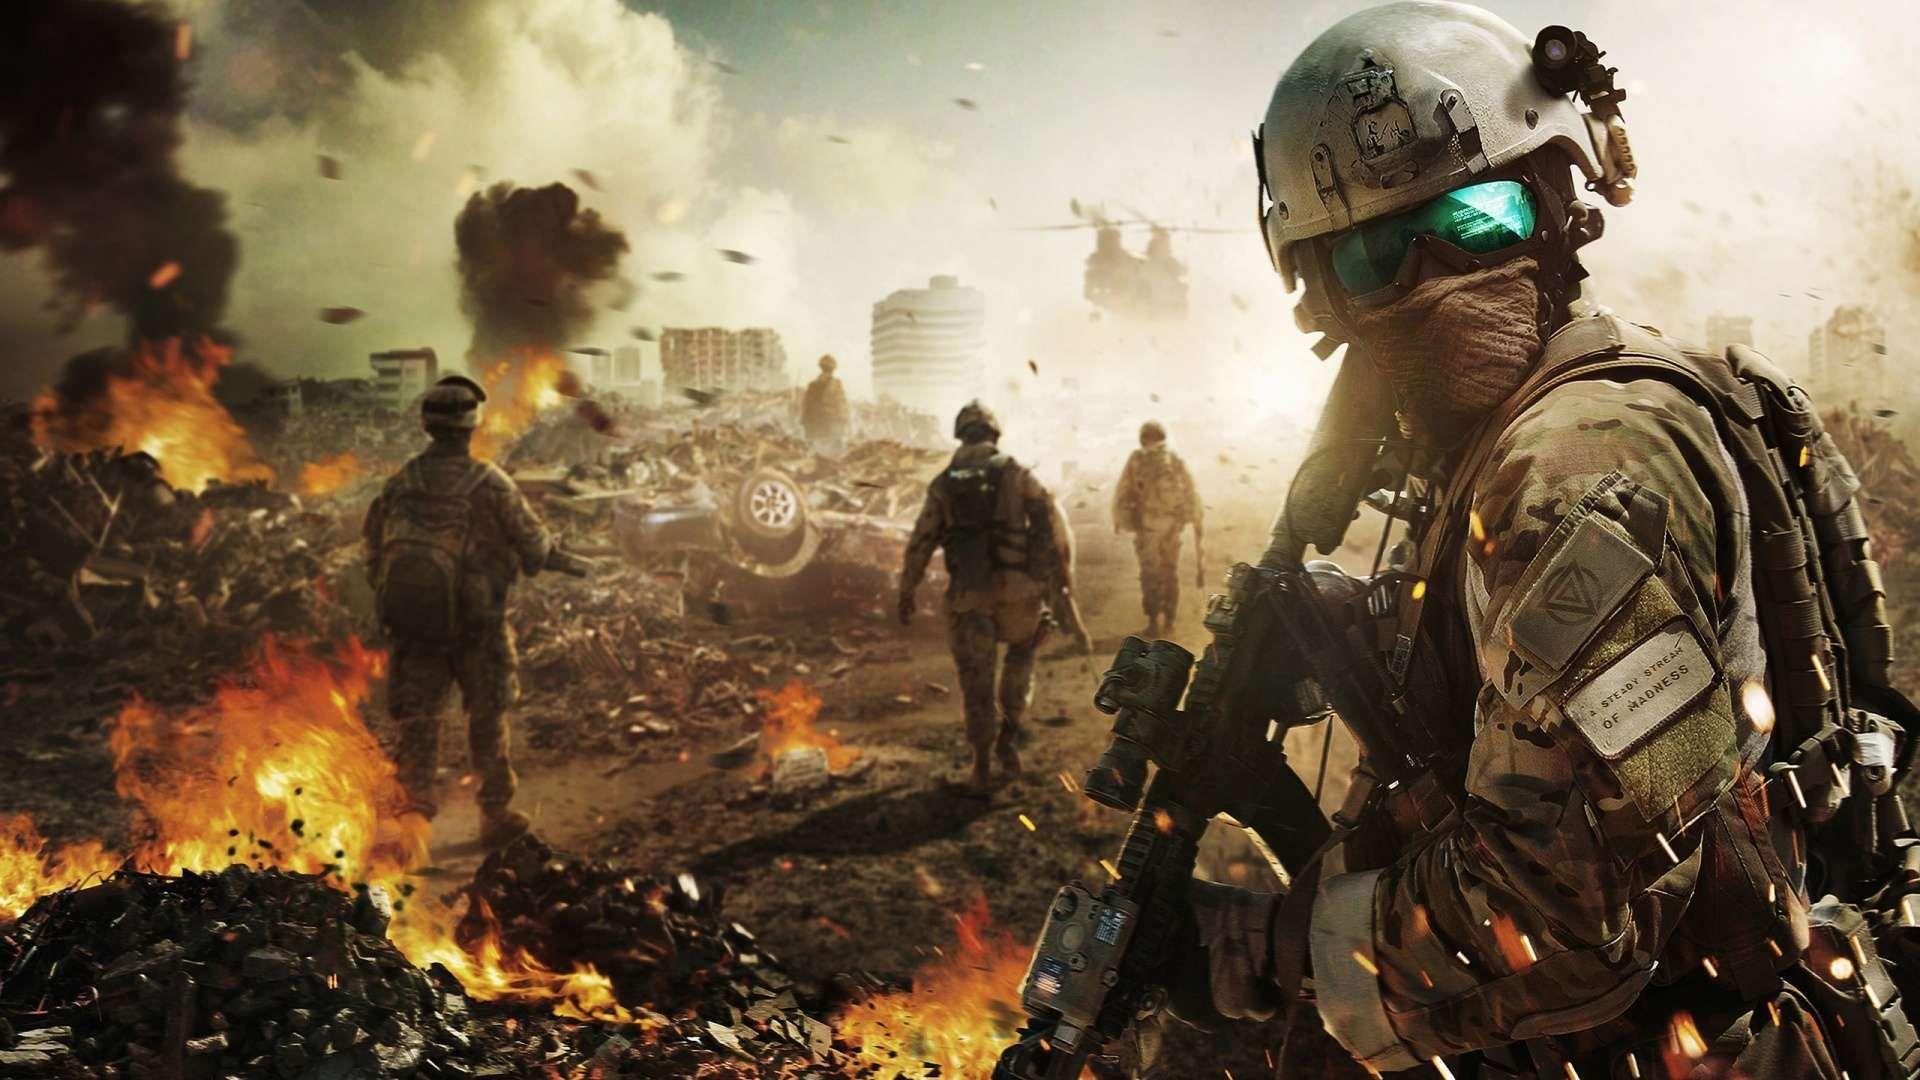 Battlefield soldier hd wallpaper 1080p sdsdasdasd - Army wallpaper hd 1080p ...